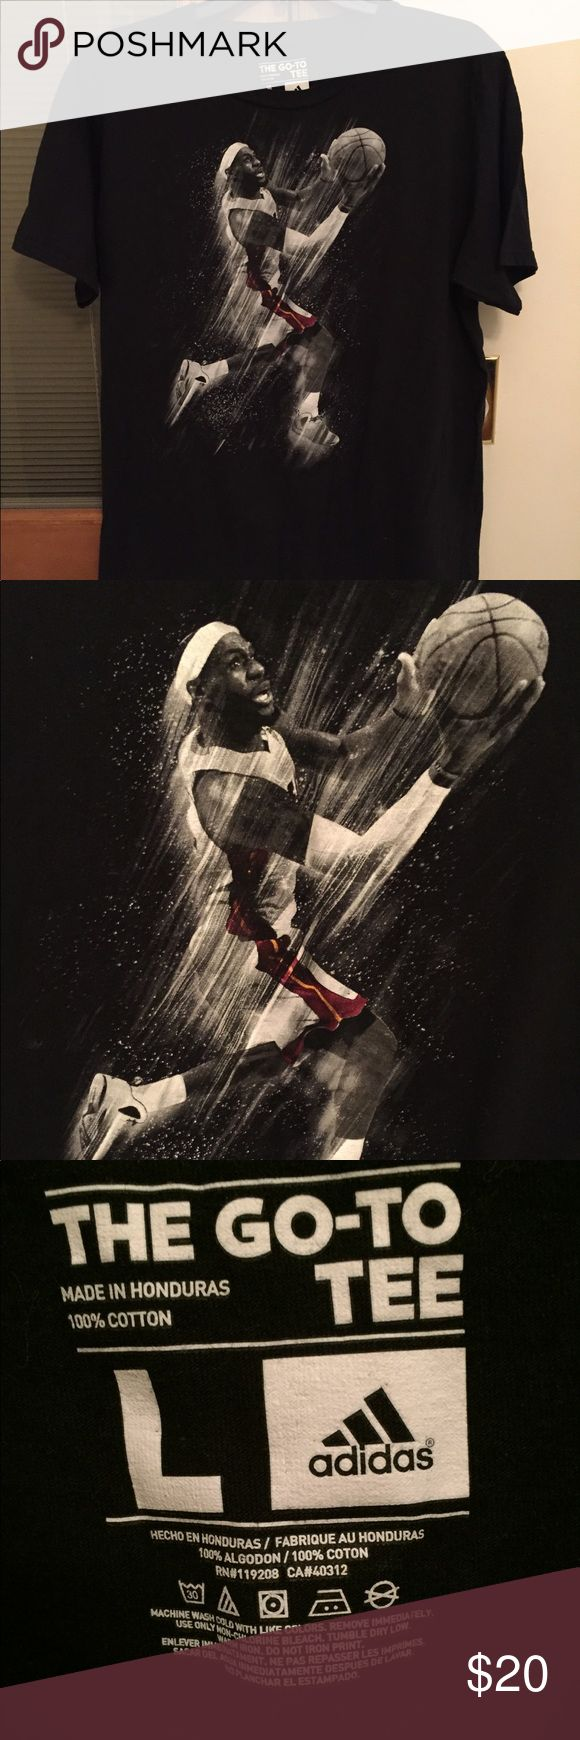 Lebron James t-shirt size L. Adidas brand Lebron James t-shirt size L. Adidas brand adidas Shirts Tees - Short Sleeve